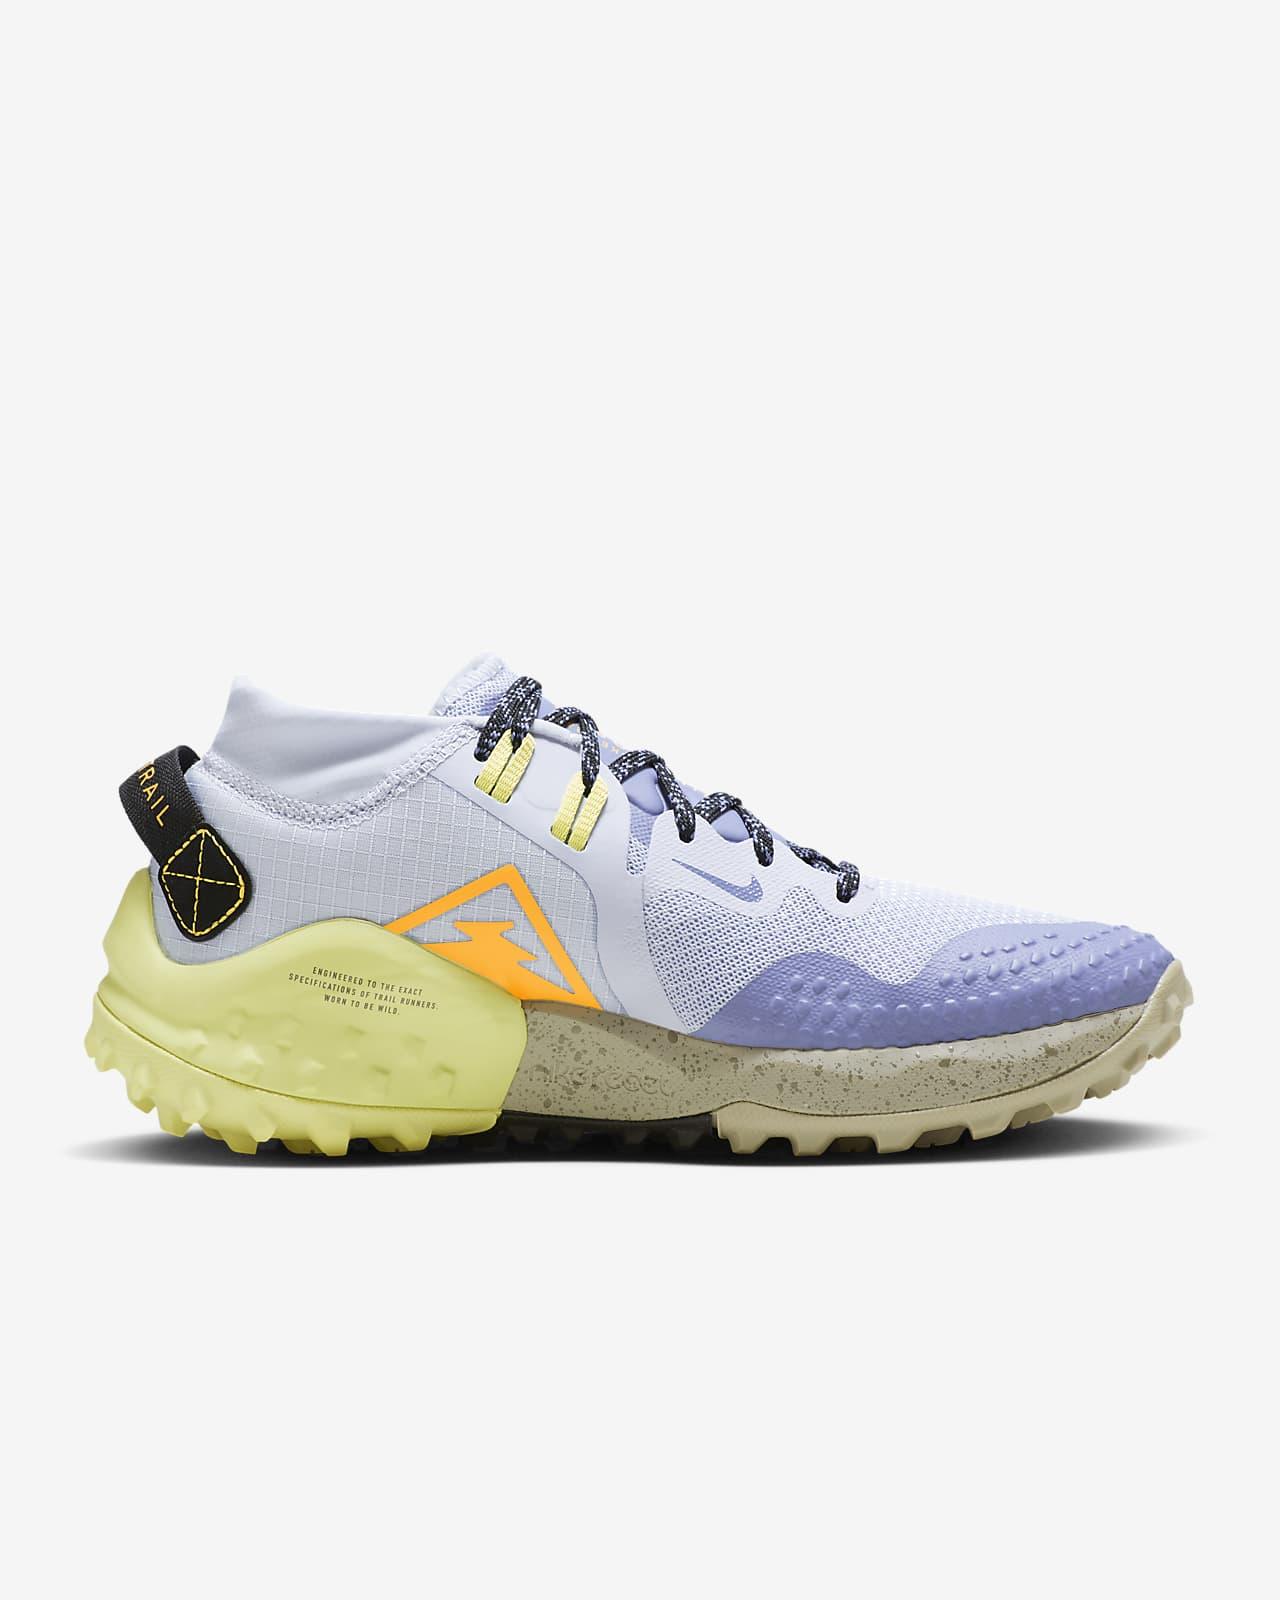 Trail Running Shoe Nike Nz